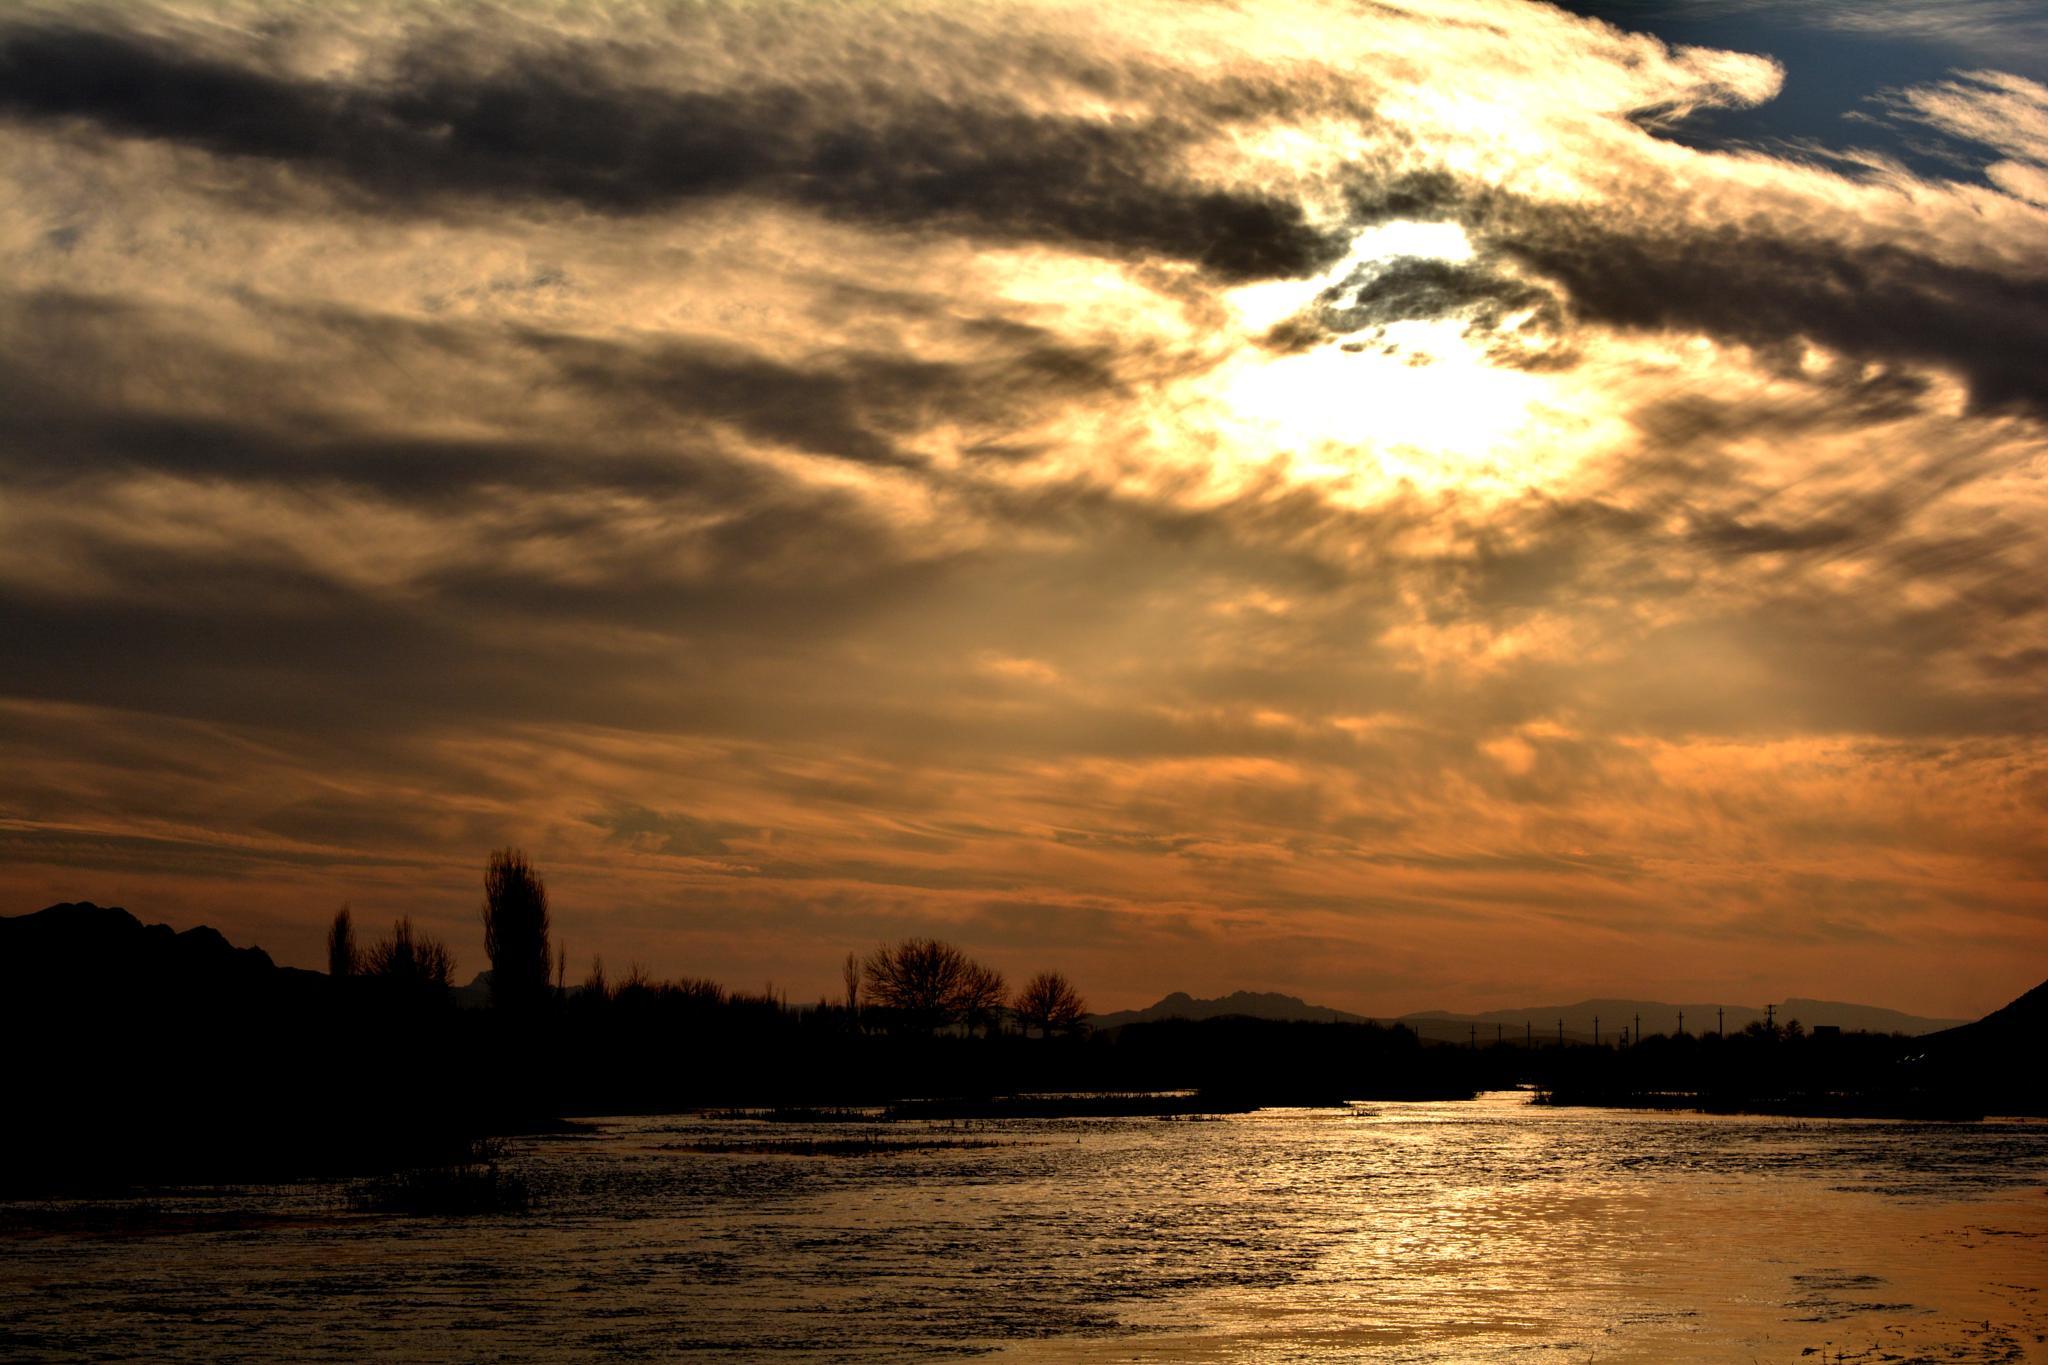 sunset by hadidadar